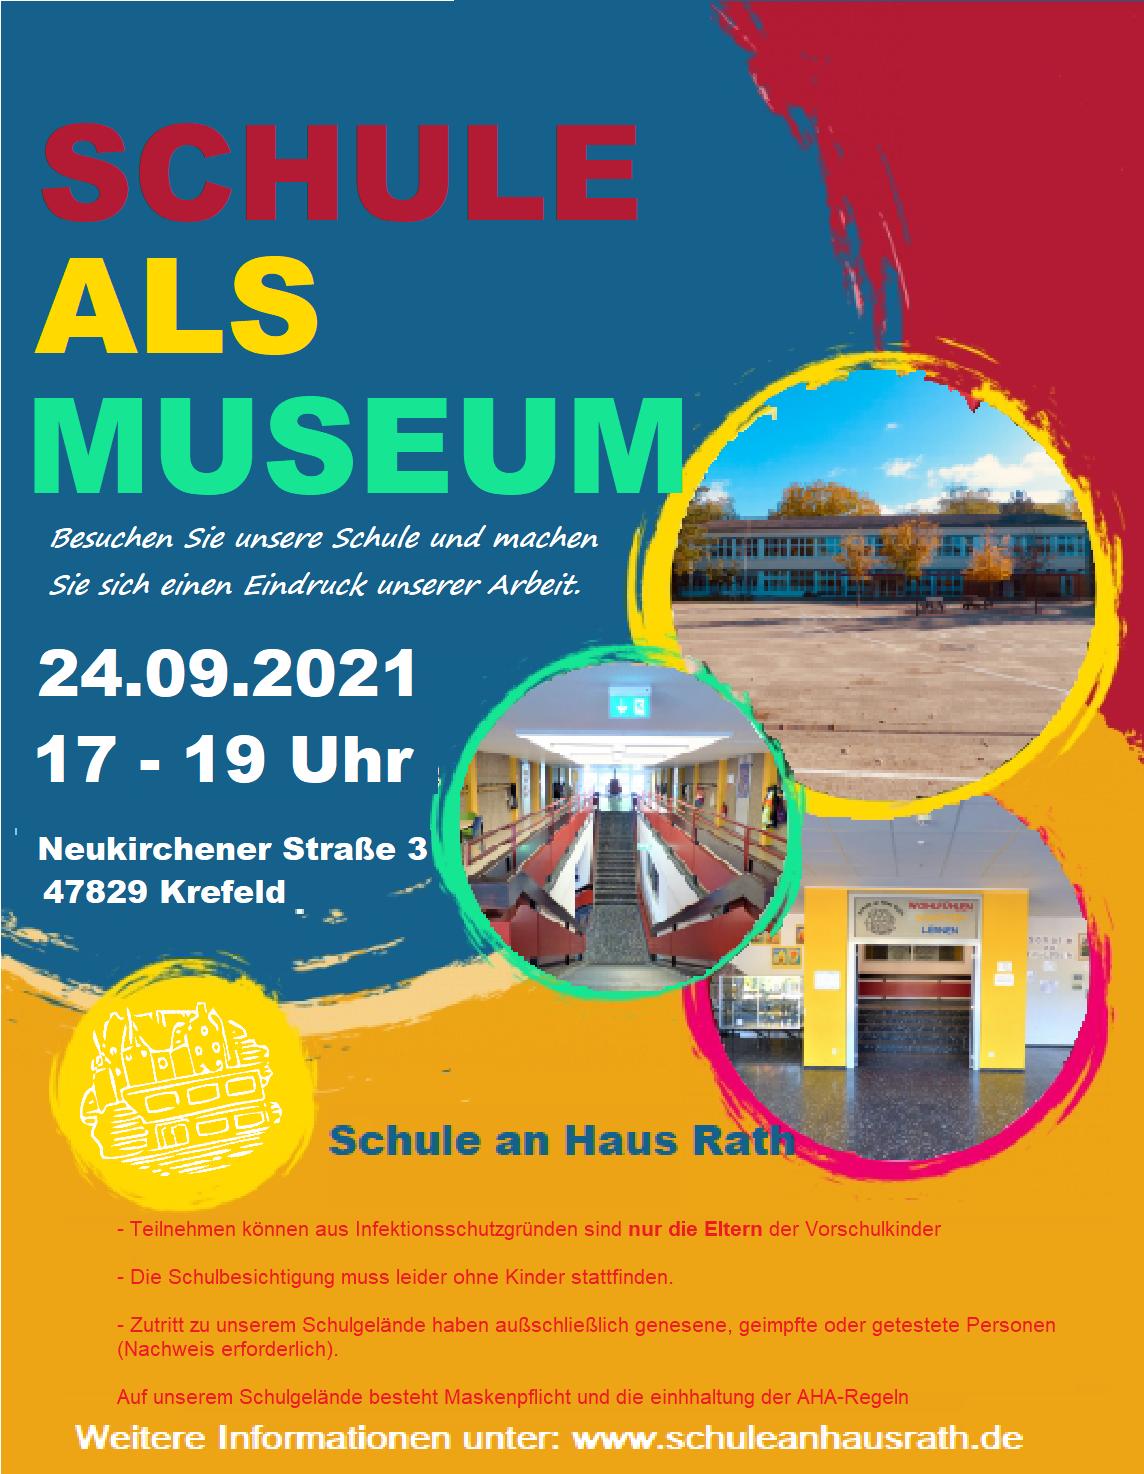 Unsere Schule als Museum